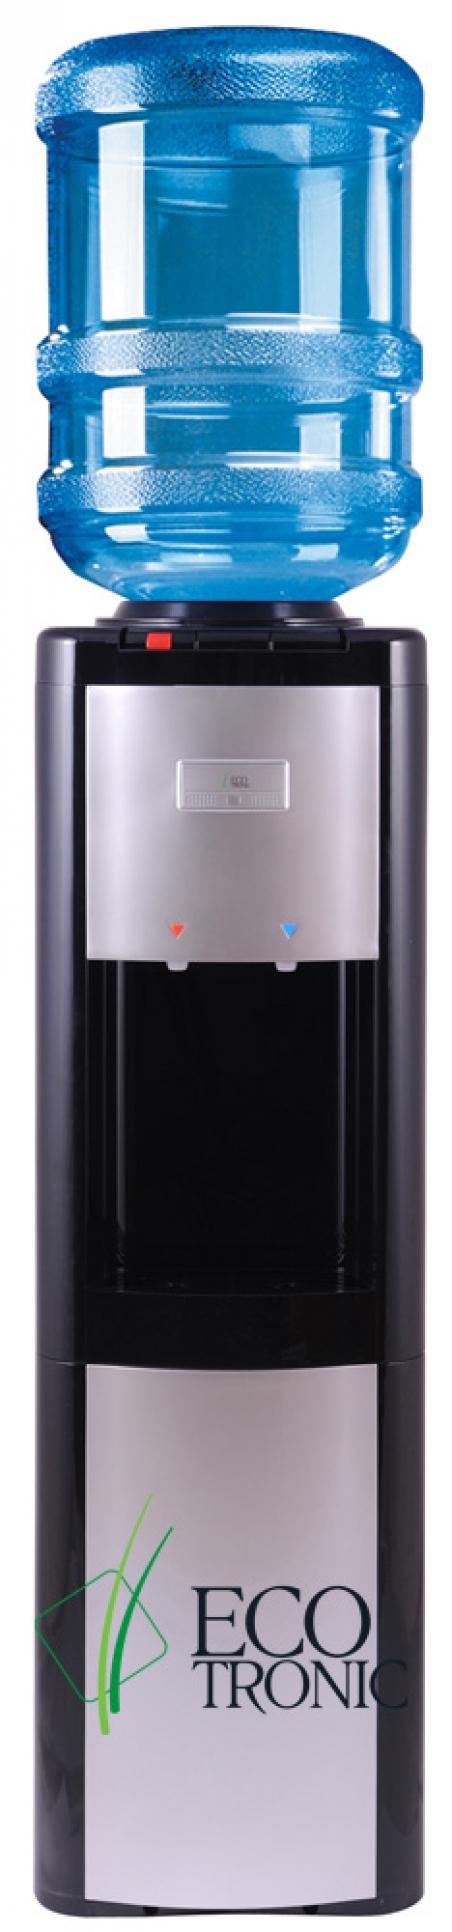 Ecotronic P4-L black/silver - 584